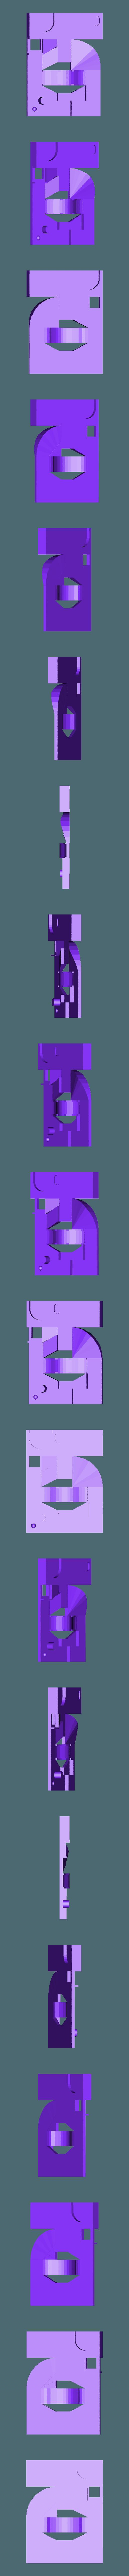 Game Card_PLAYGROUND.stl Download free STL file The MARBLE BOY • 3D printing model, Janis_Bruchwalski